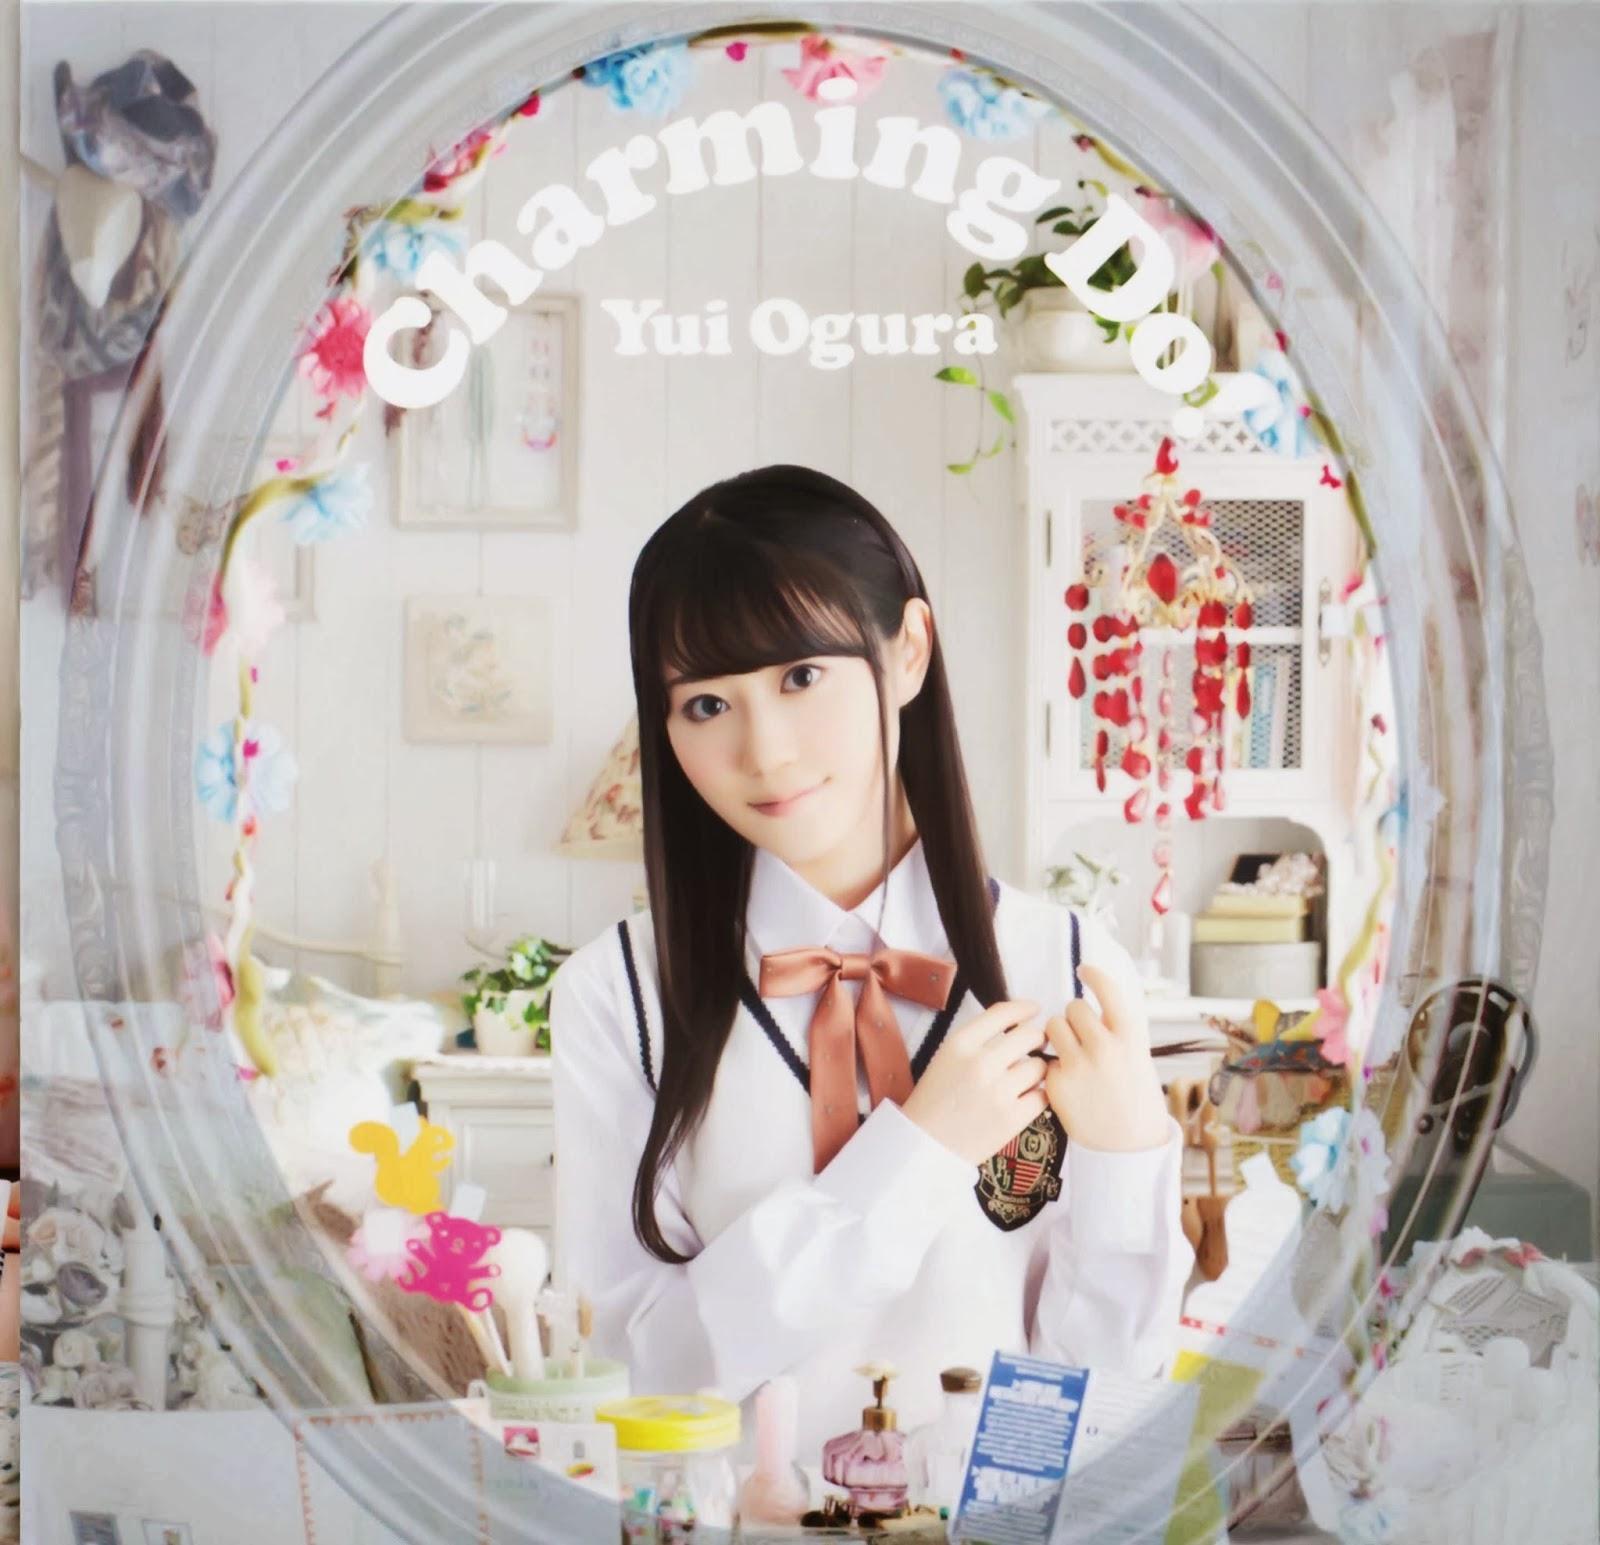 AKB48 And Family: [Single] Yui Ogura